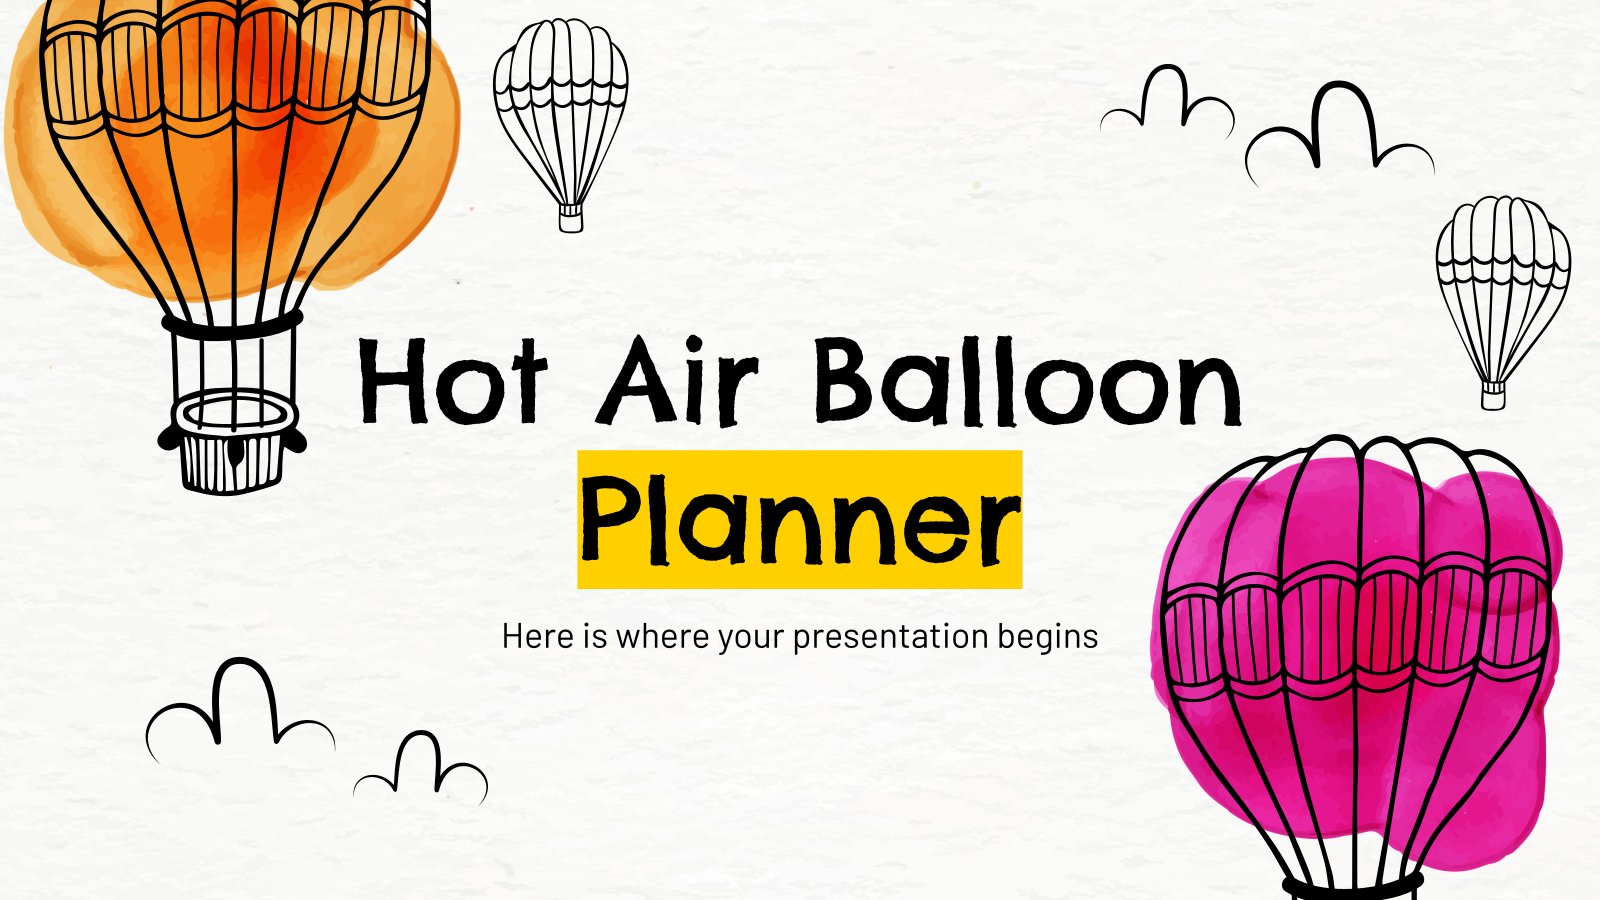 Hot Air Balloon Planner presentation template